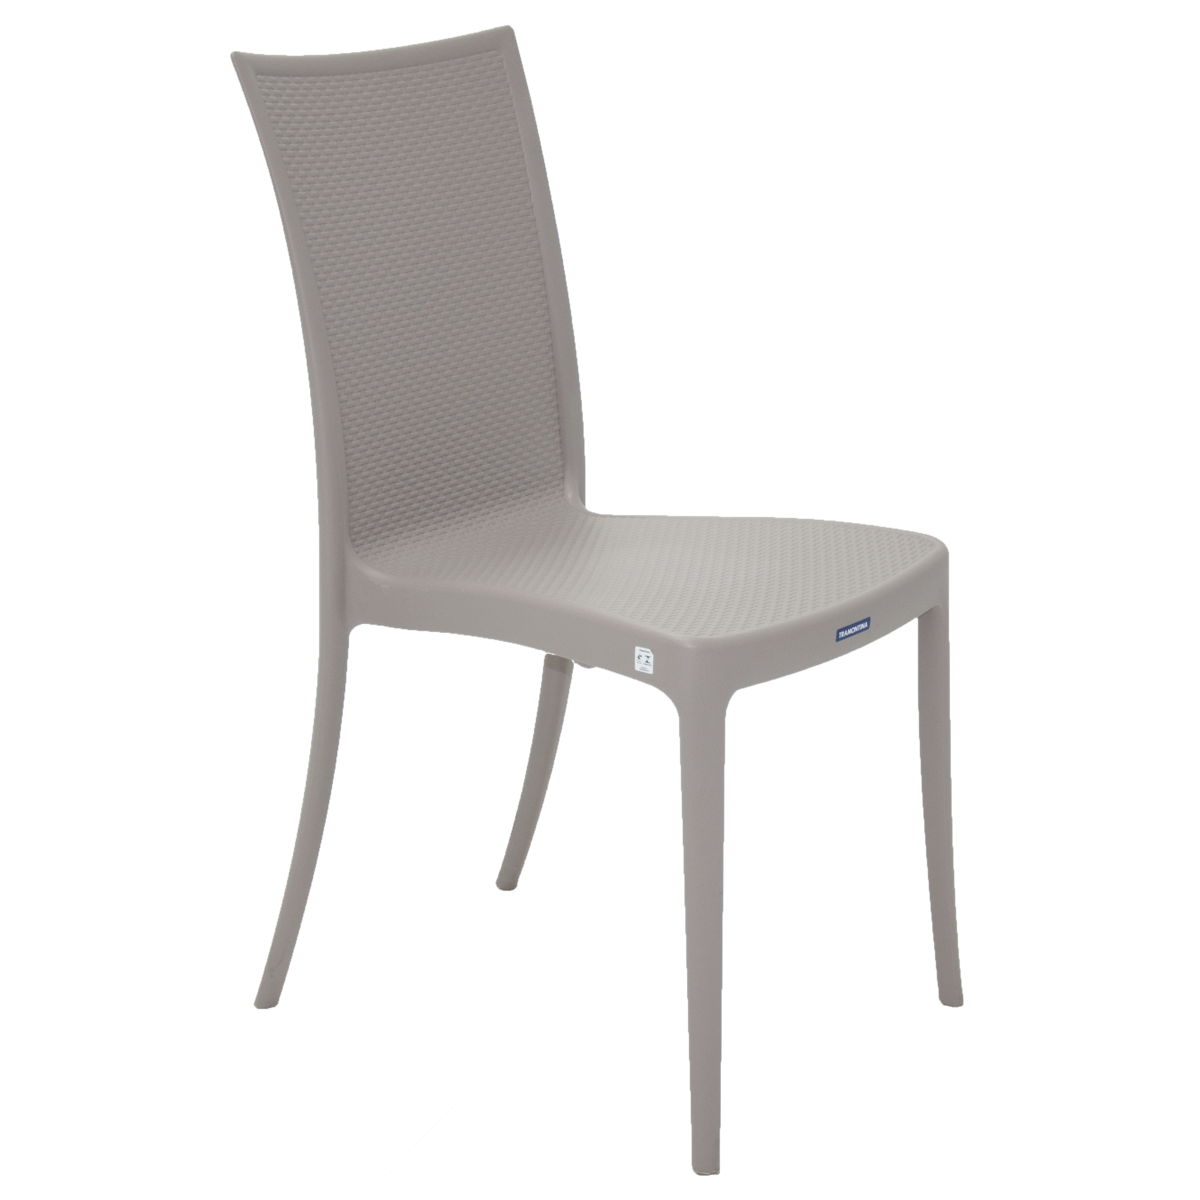 Cadeira Laura Polipropileno e Fibra de Vidro Camurca - Tramontina